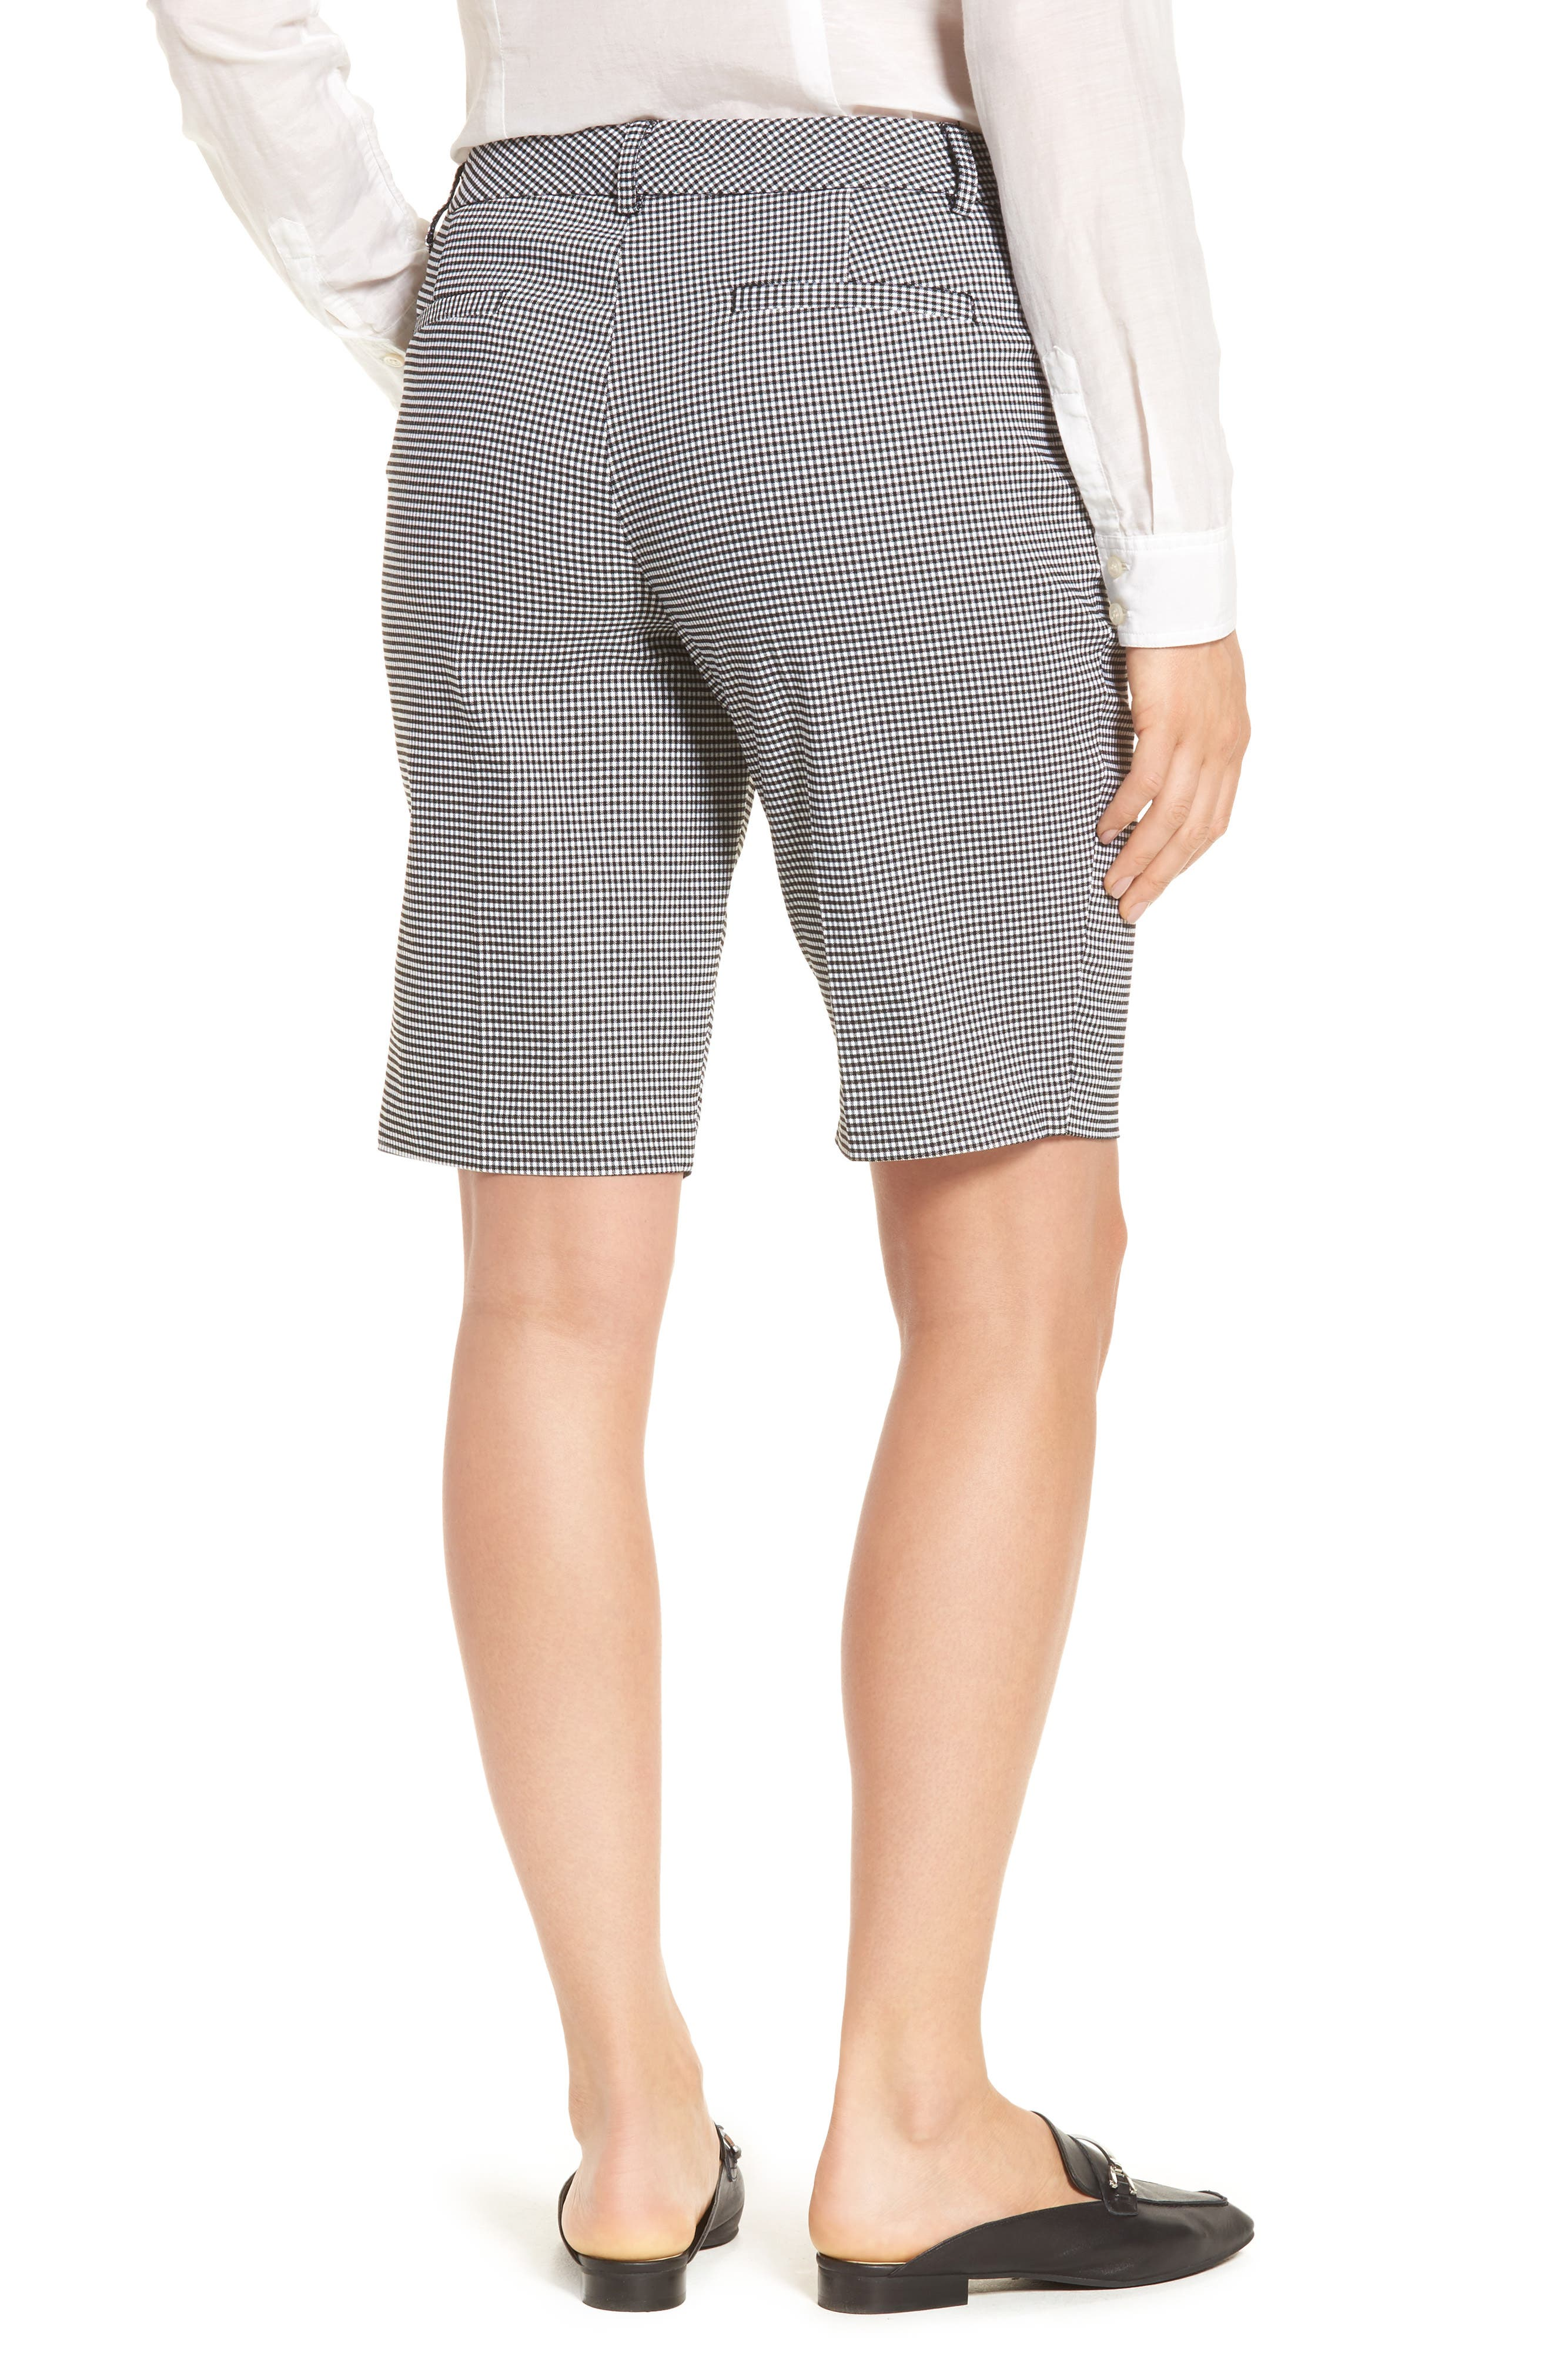 Stretch Bermuda Shorts,                             Alternate thumbnail 2, color,                             Black- White Gingham